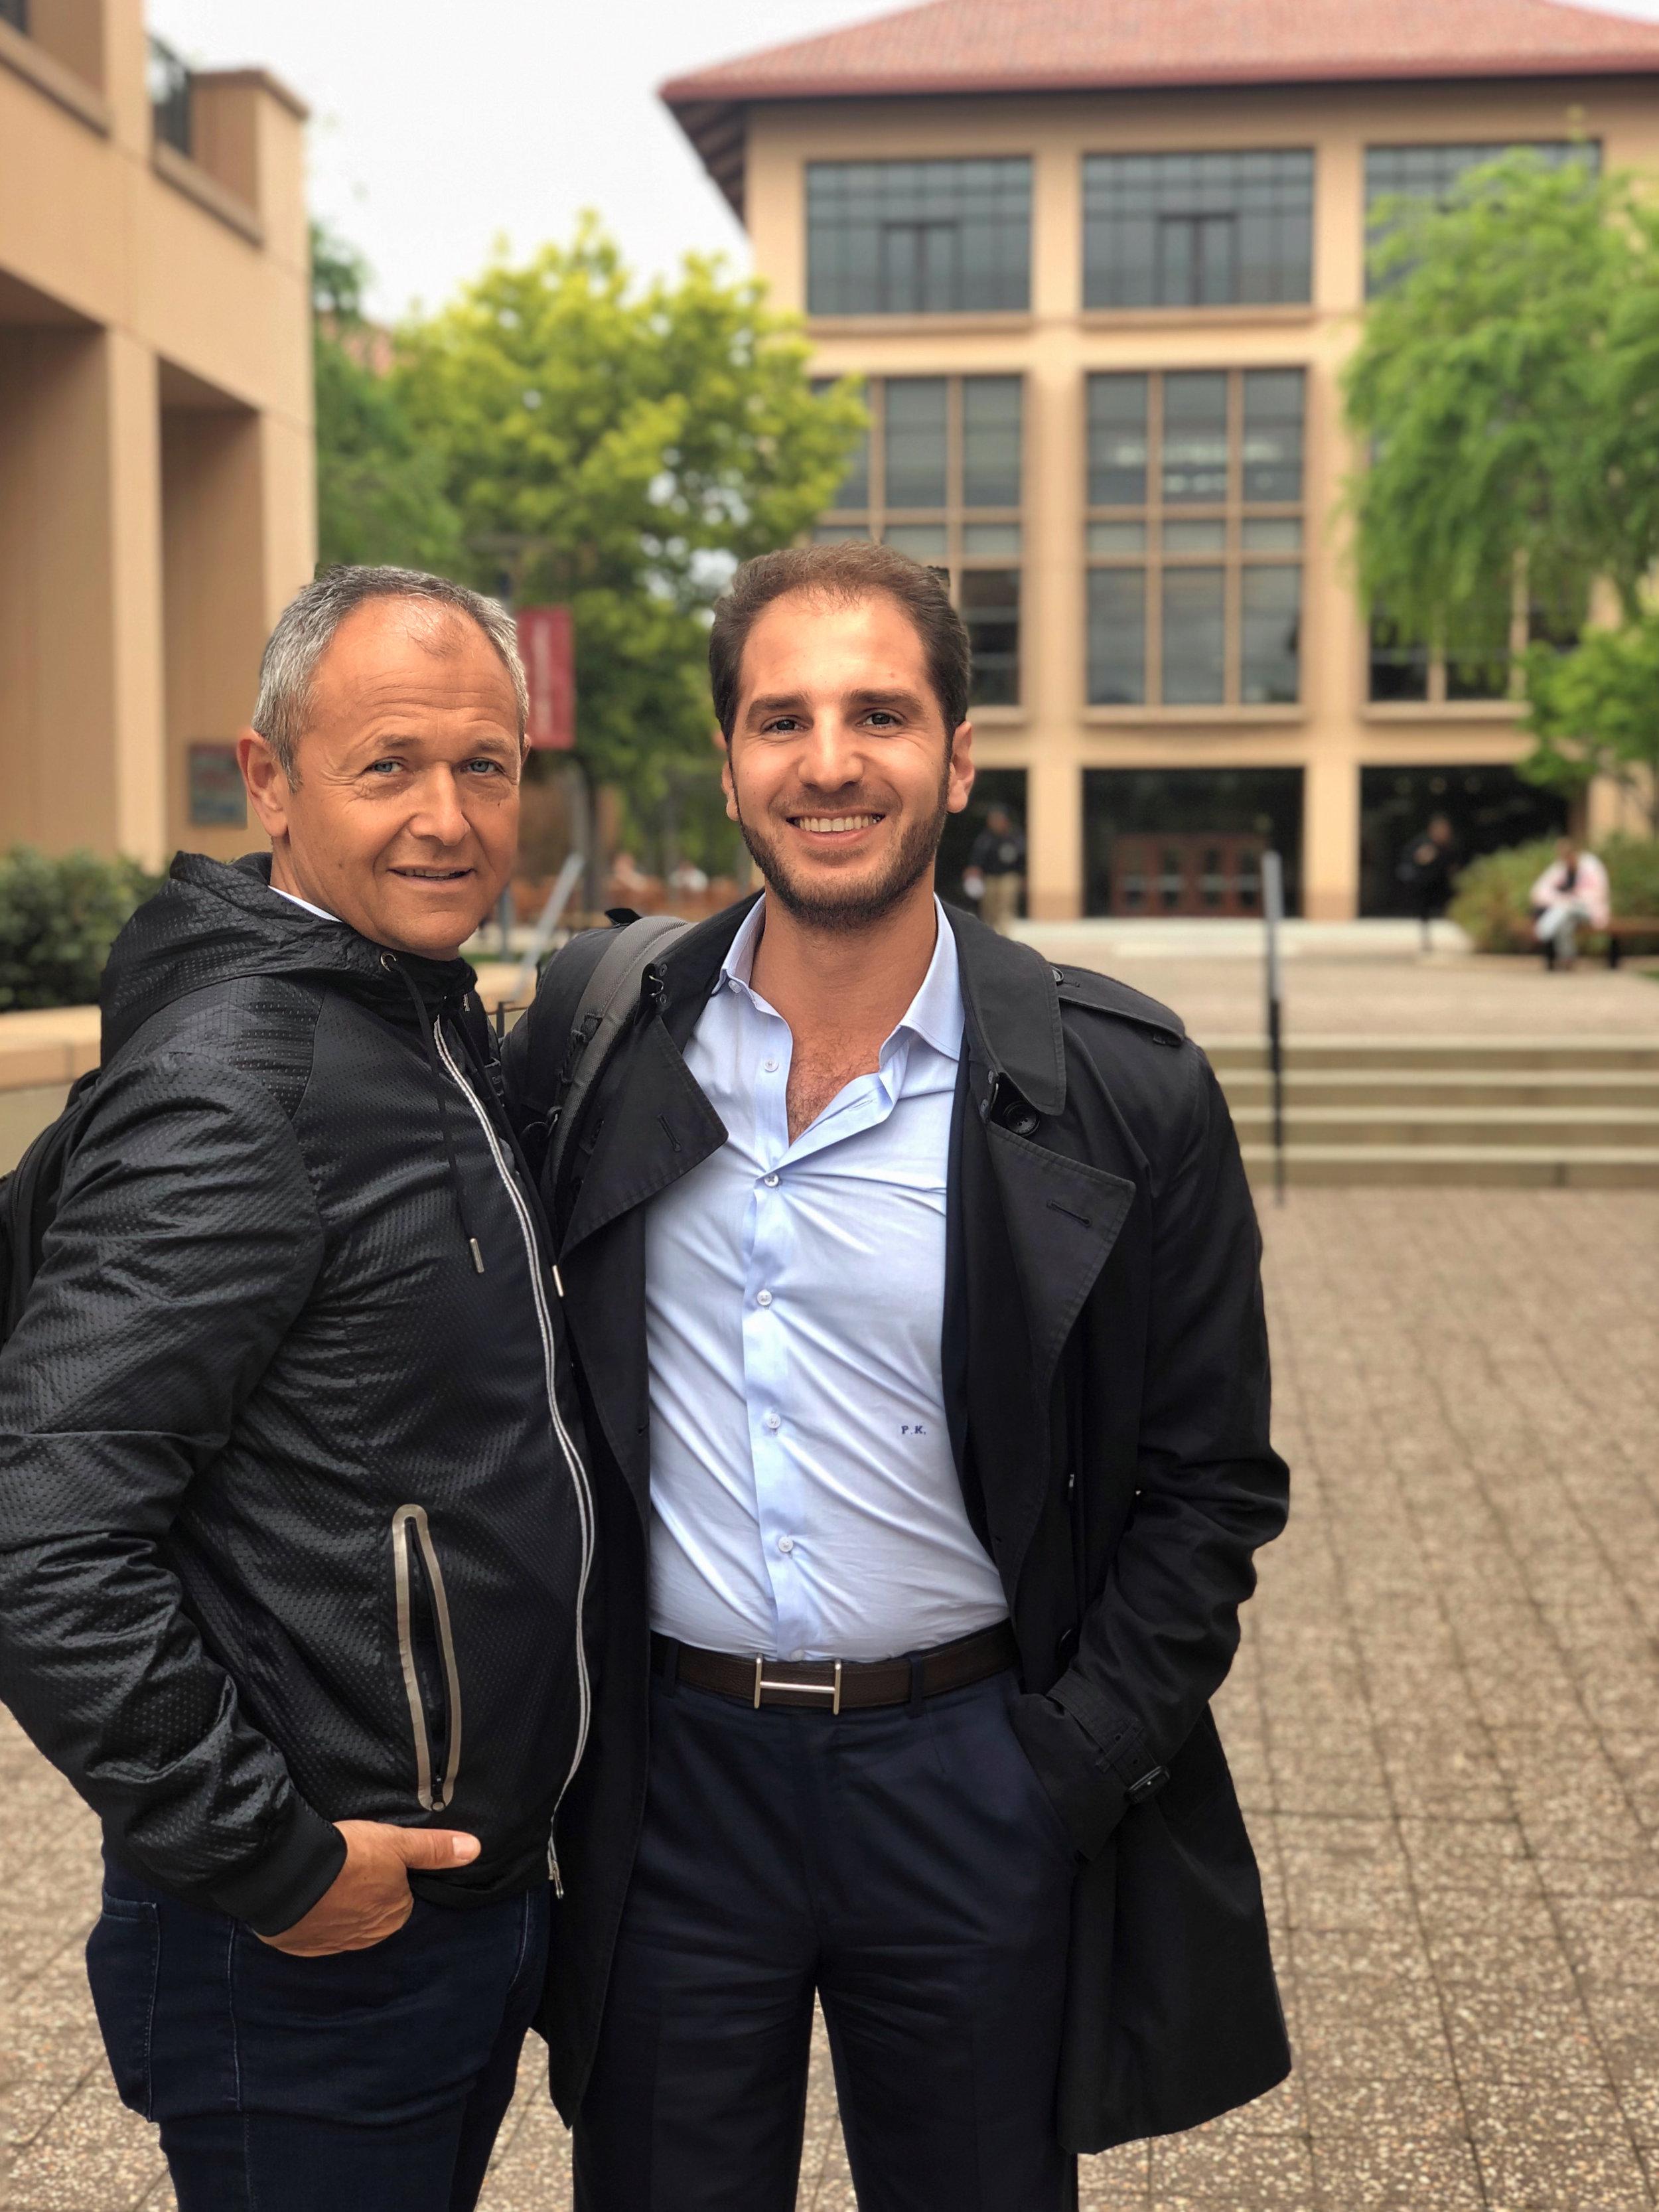 Paul Klimos & Jan Mühlfeit, Former Chairman of Microsoft Europe